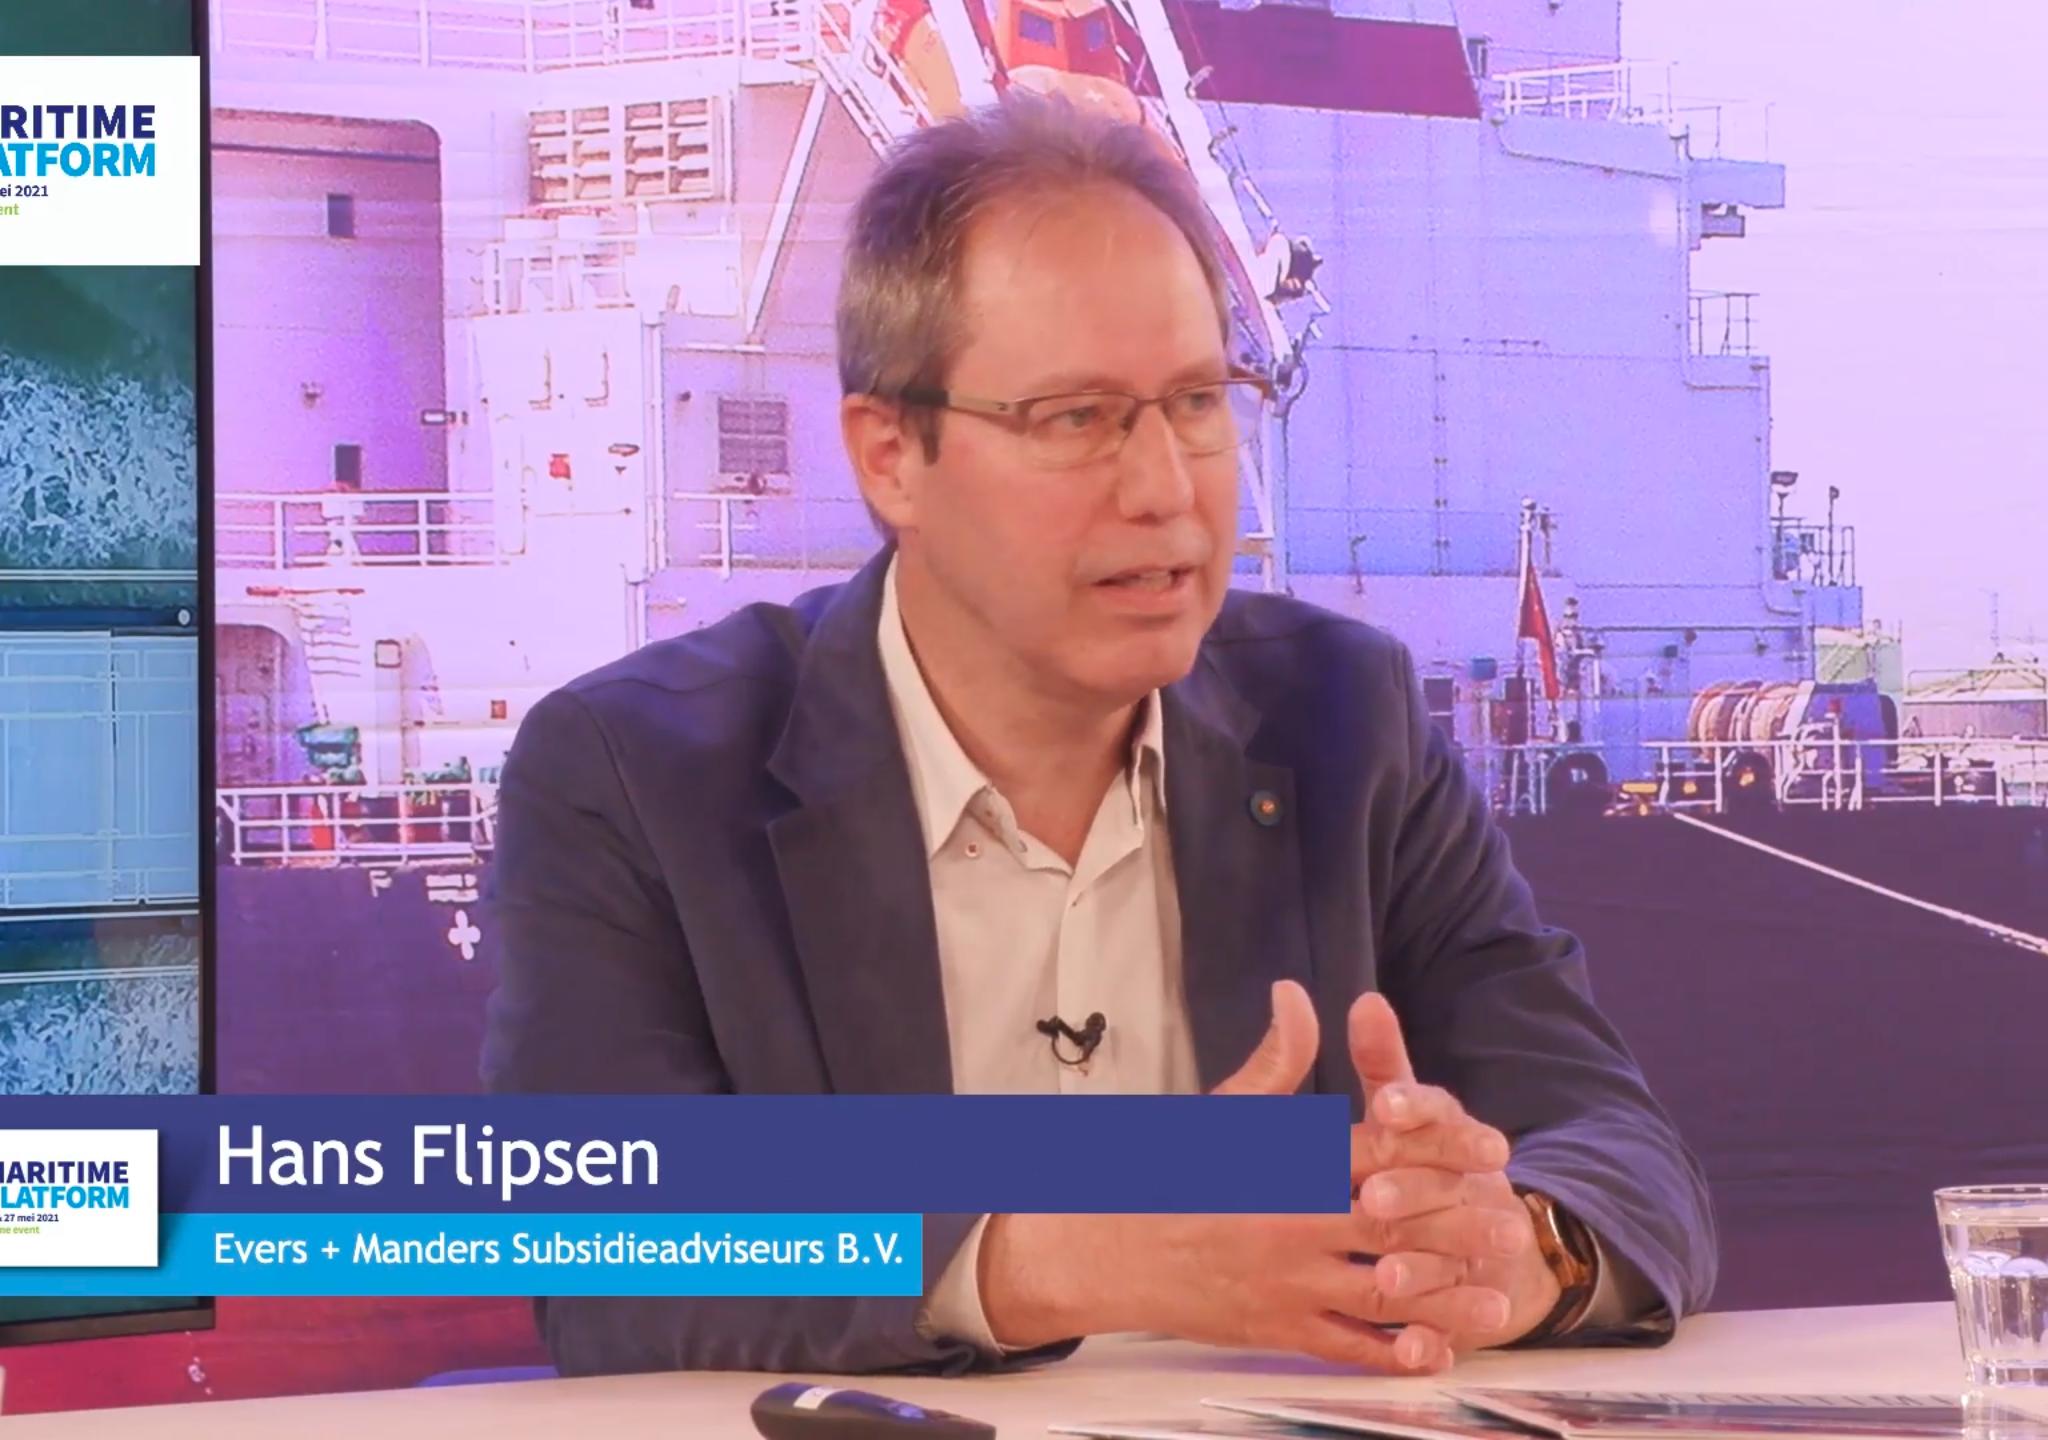 Subsidieadviseur Hans Flipsen was te gast bij Maritime Platform 2021